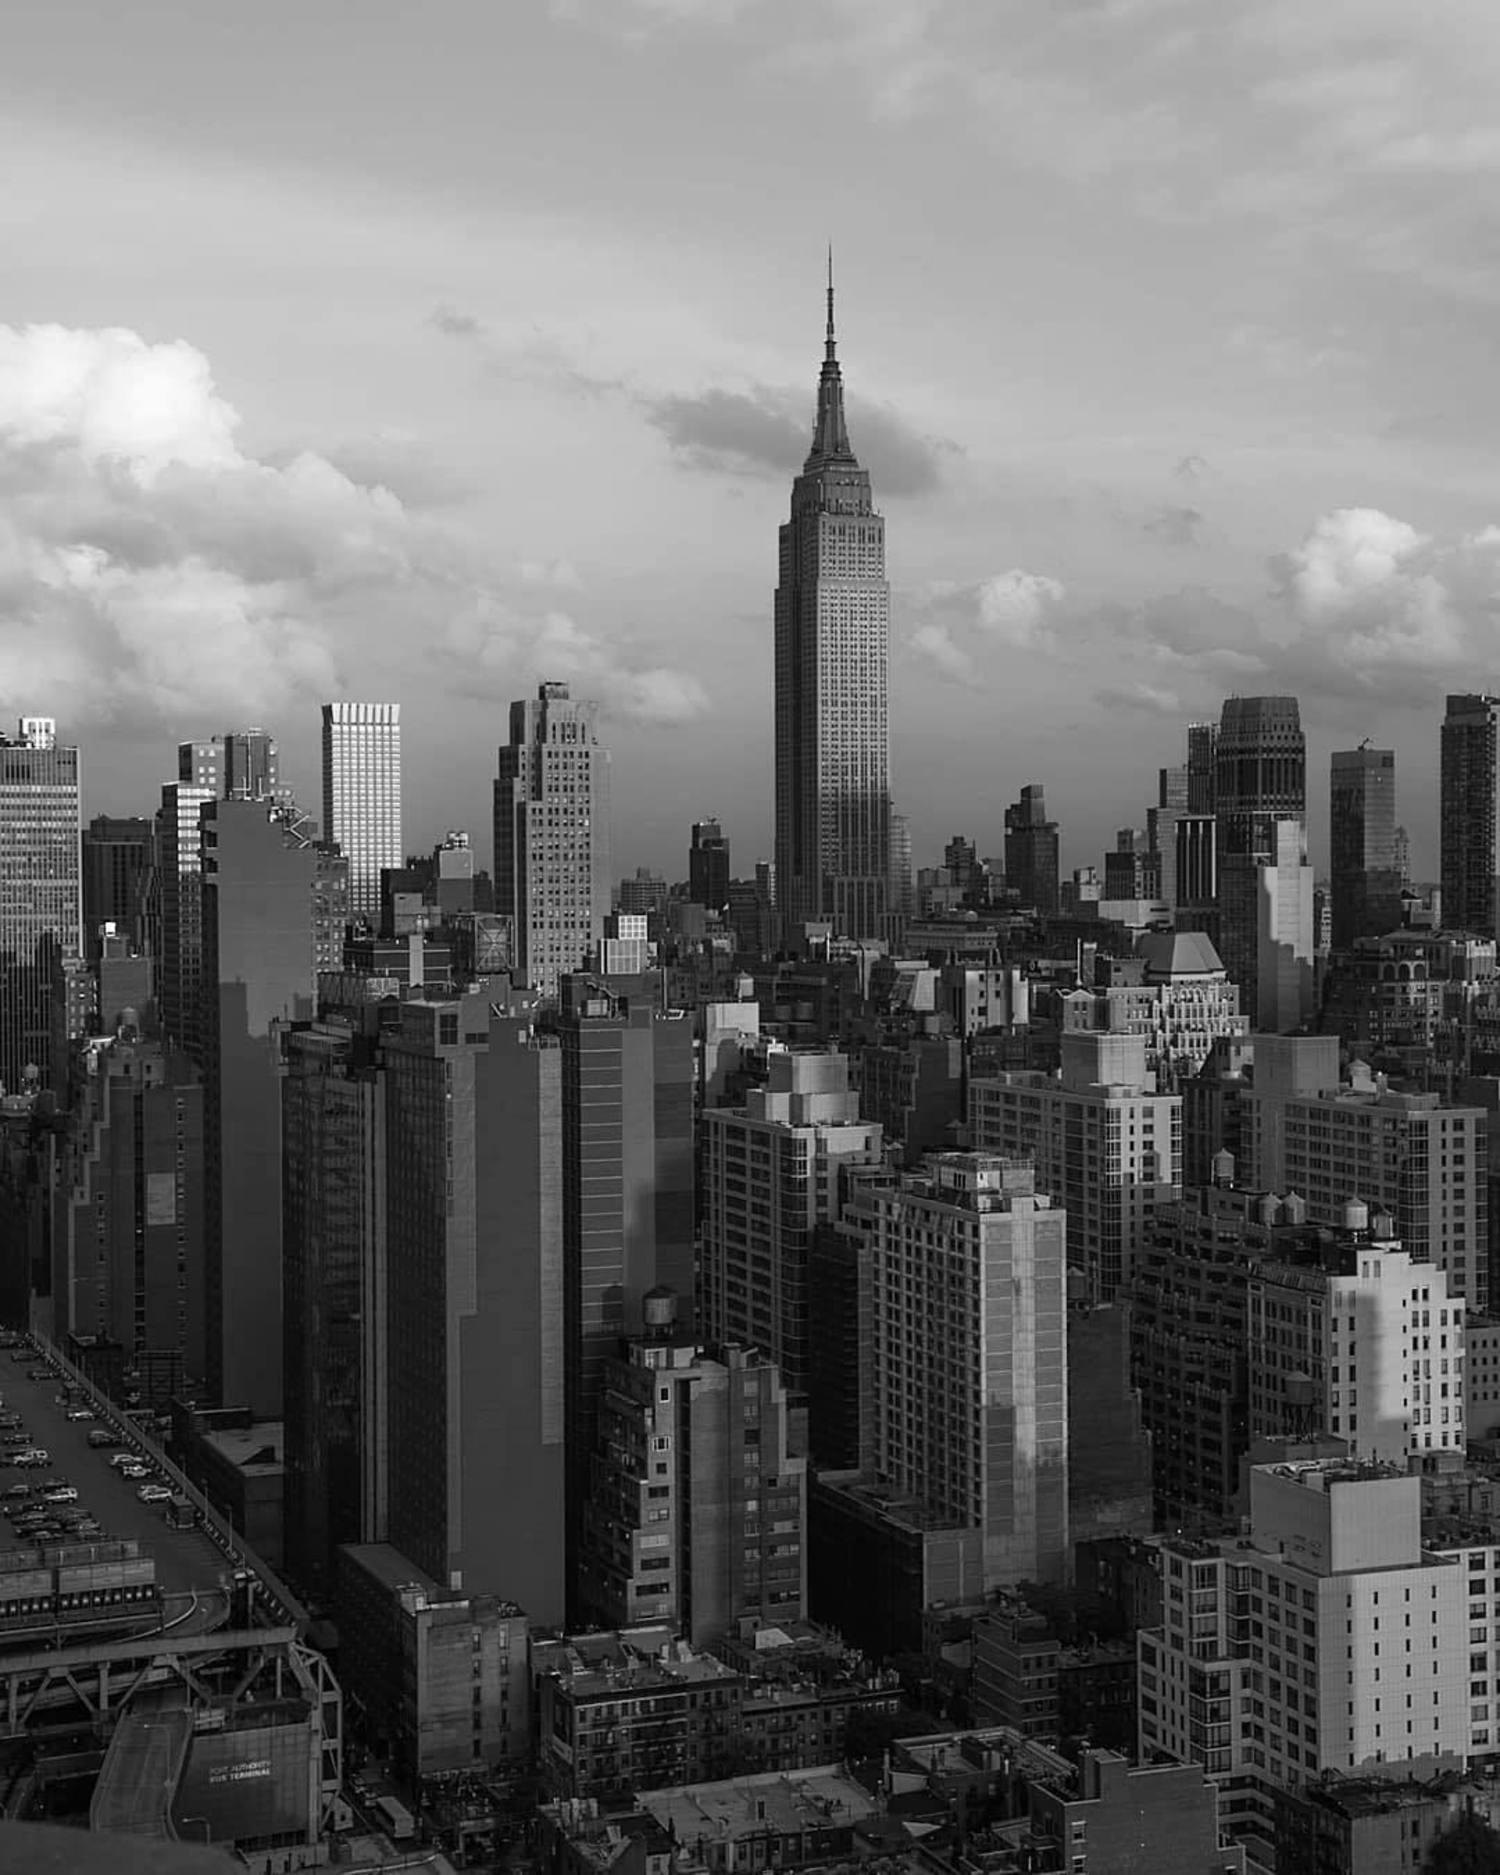 New York, New York. Photo via @m_bautista330 #viewingnyc #nyc #newyork #newyorkcity #empirestatebuilding